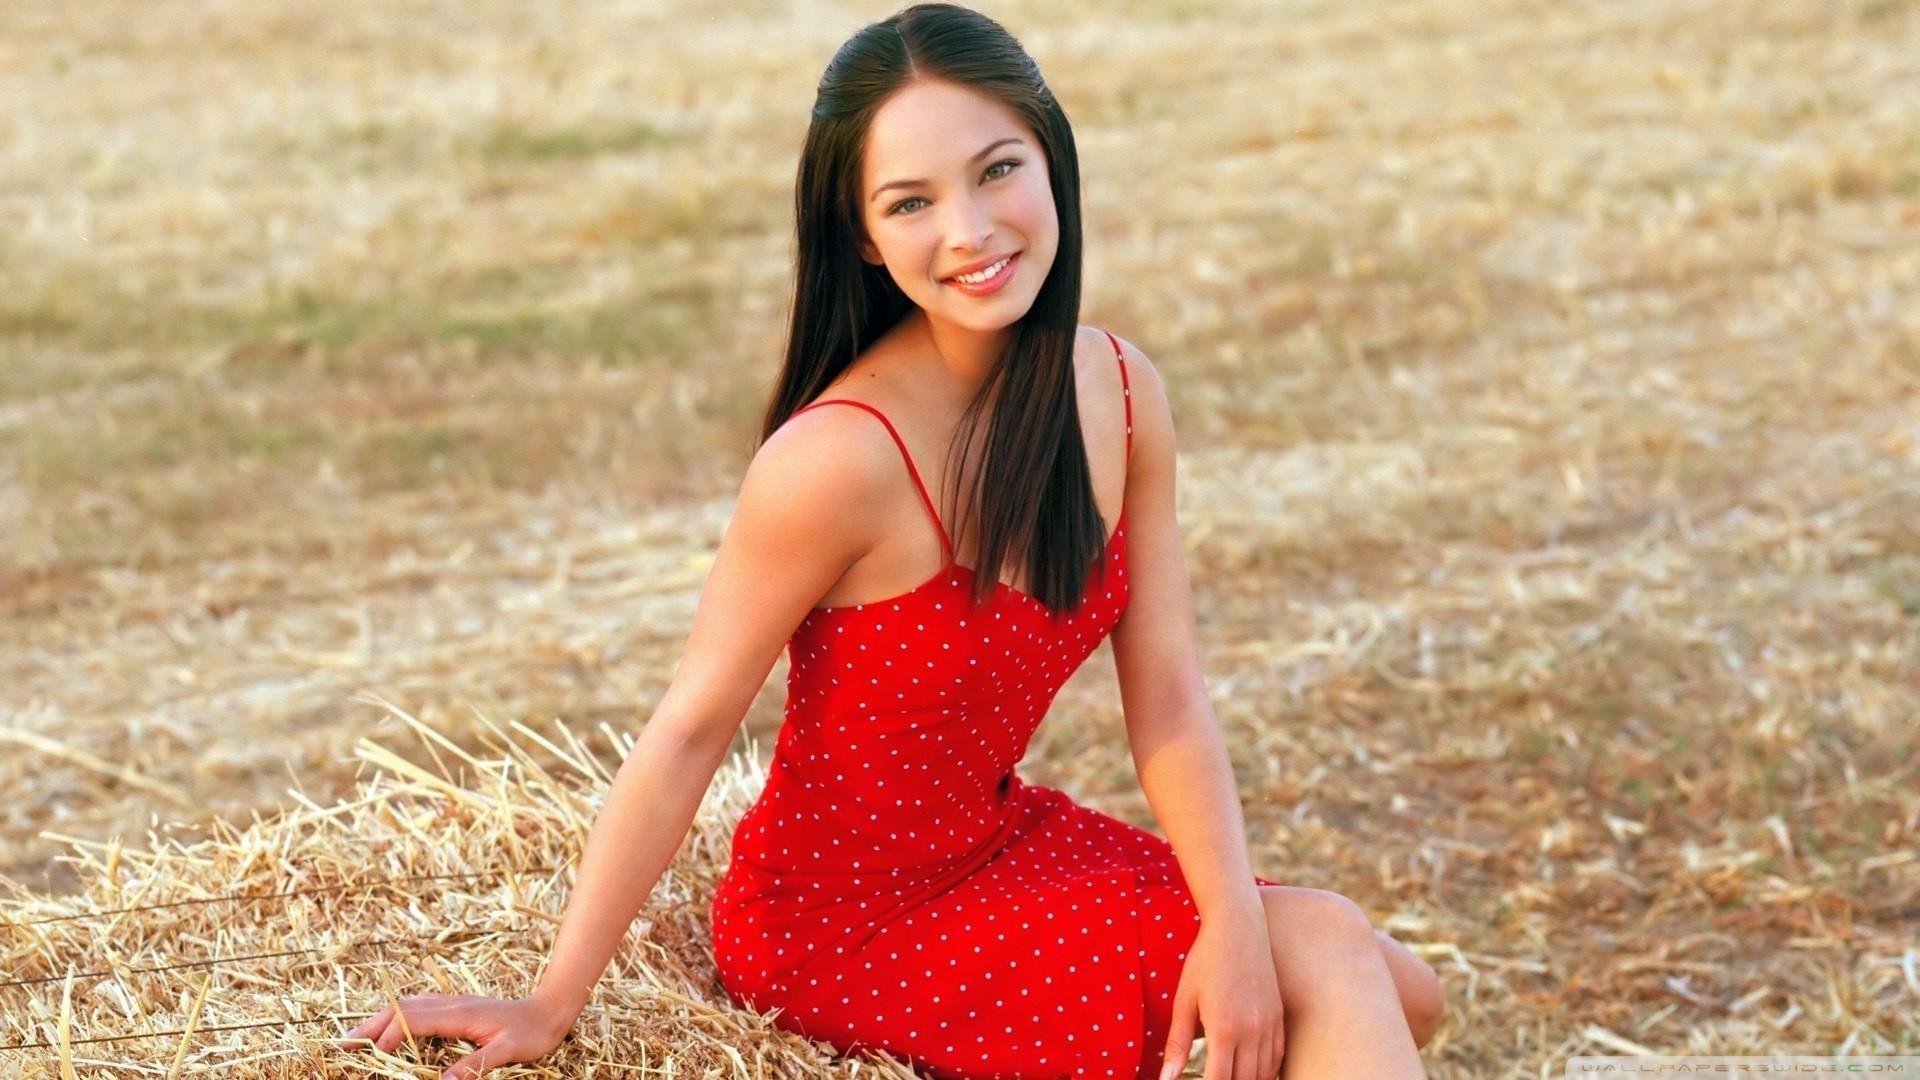 Kristin Kreuk in Red Dress HD Wide Wallpaper for Widescreen